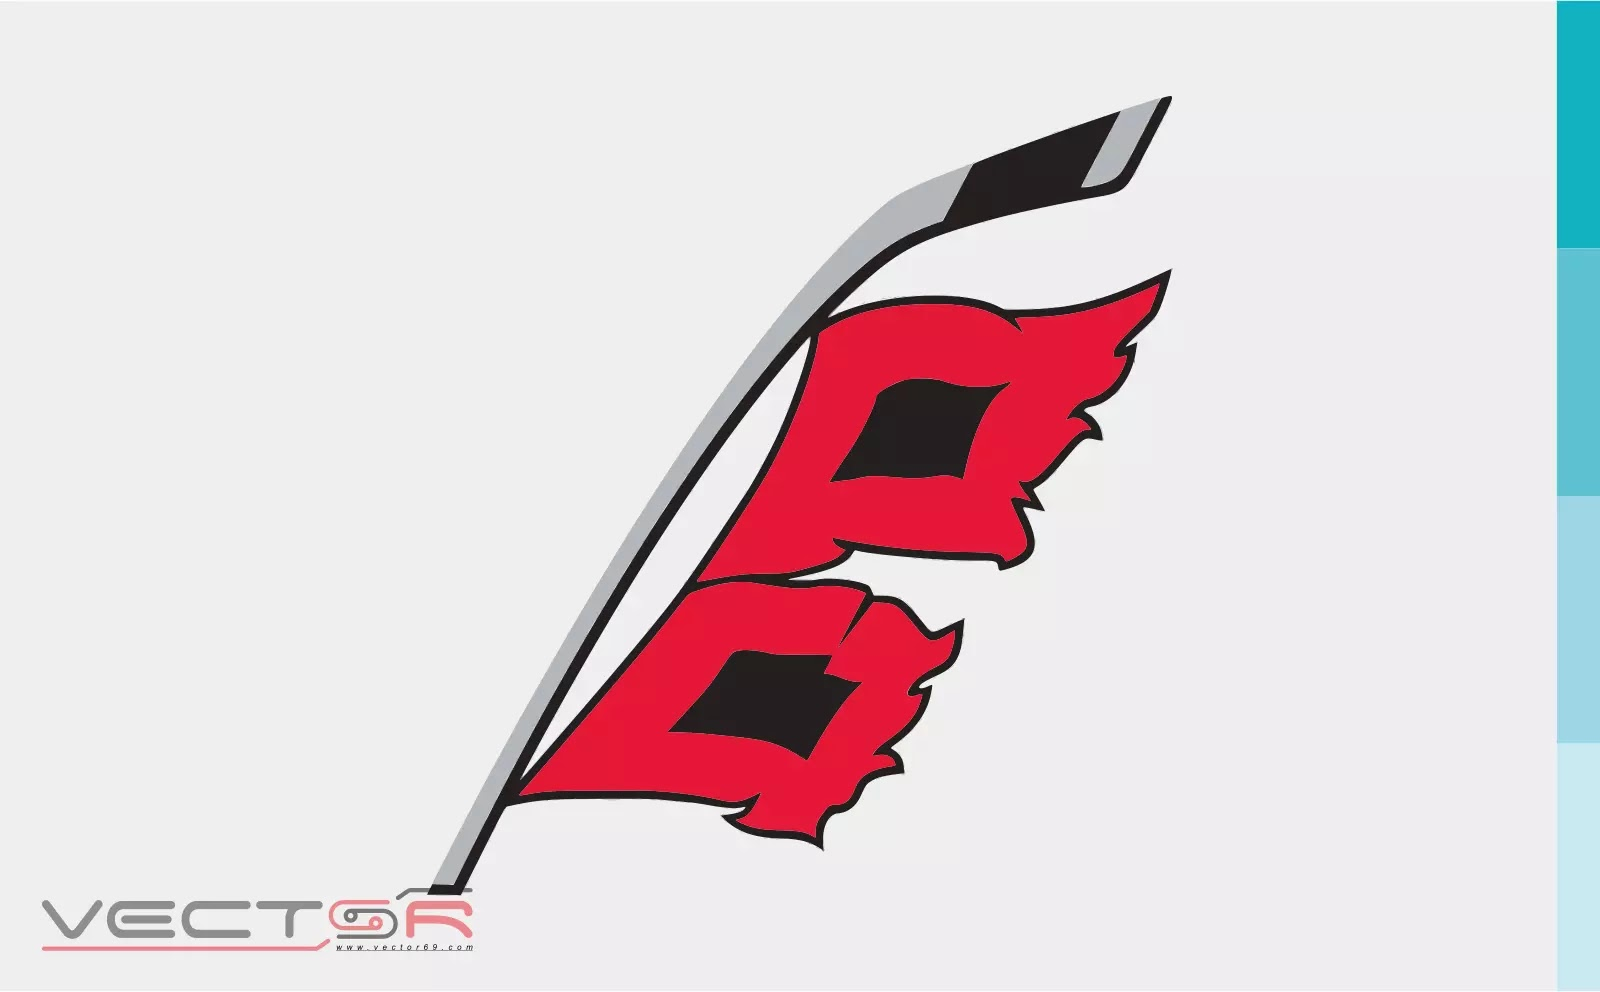 Carolina Hurricanes (2018) Secondary Logo - Download Vector File SVG (Scalable Vector Graphics)